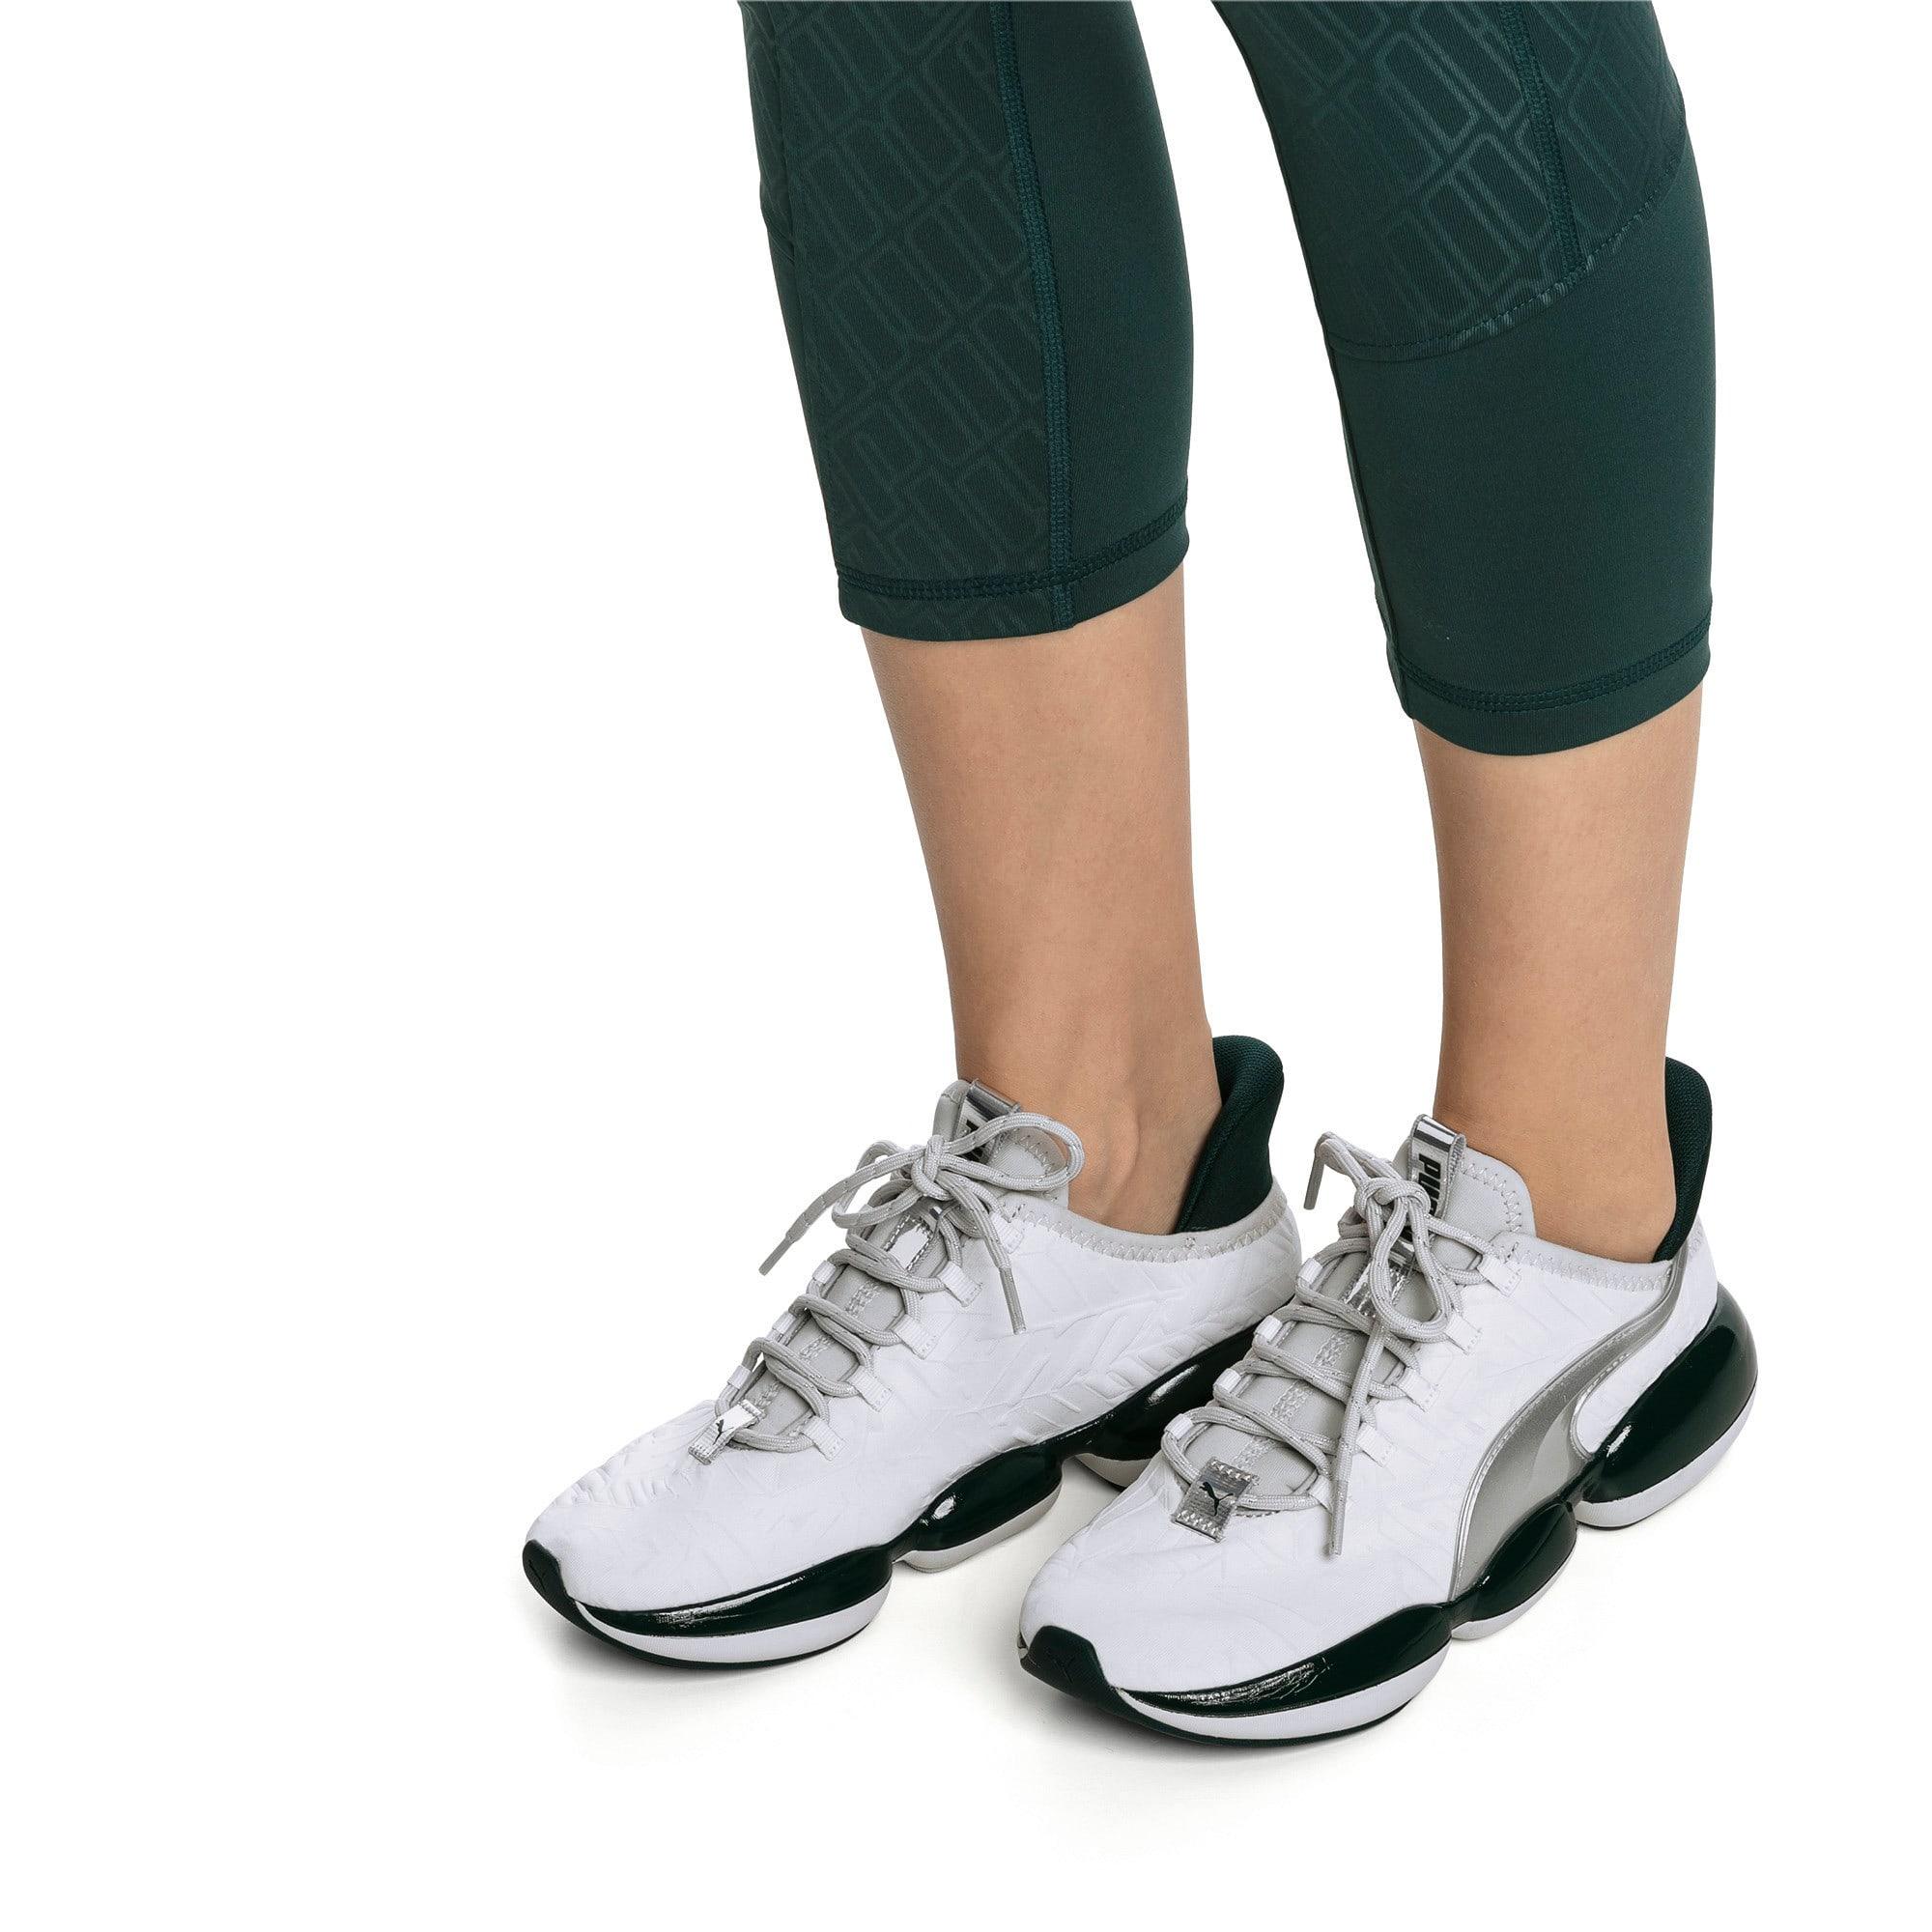 Thumbnail 2 of Mode XT Trailblazer Women's Trainers, Puma White-Ponderosa Pine, medium